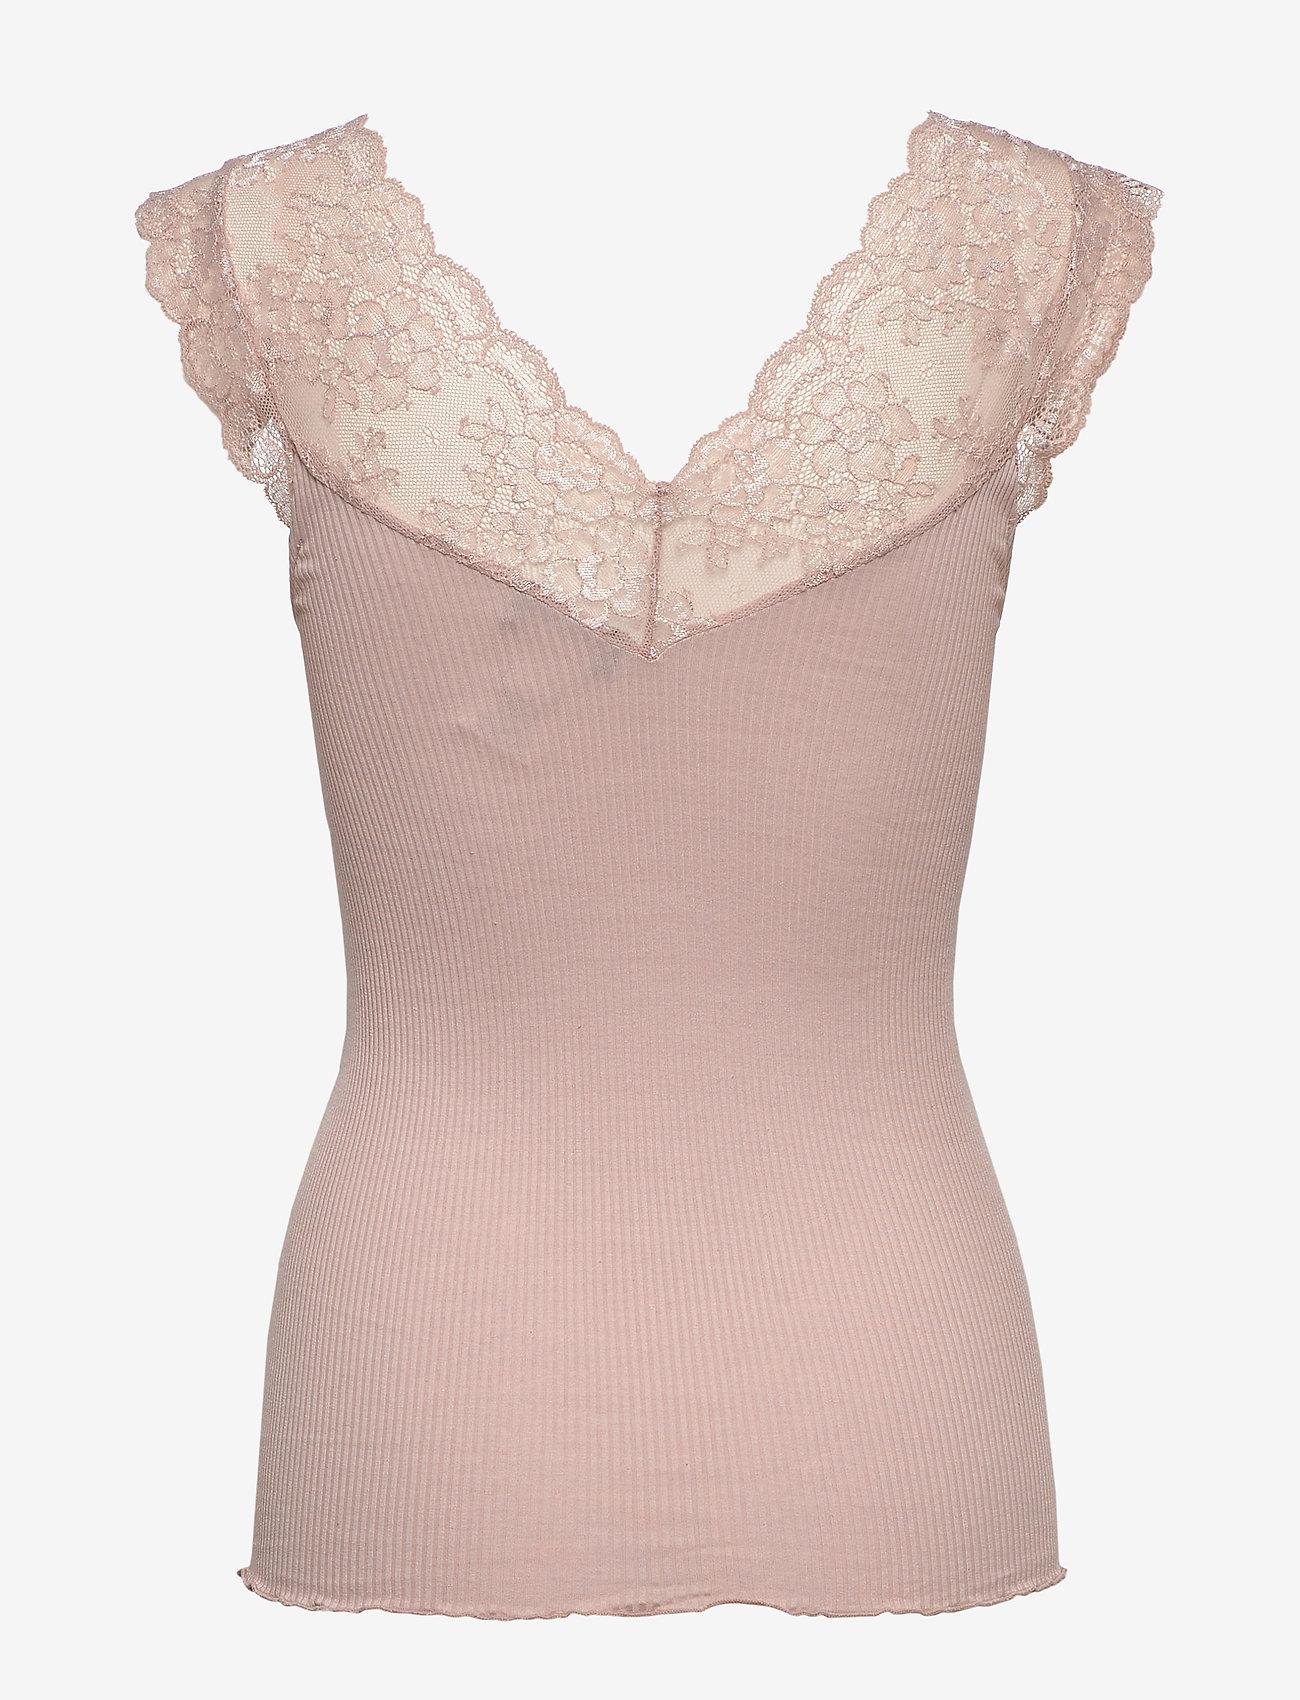 Silk Top Regular W/lace (Vintage Powder) (35.40 €) - Rosemunde 0xXzR